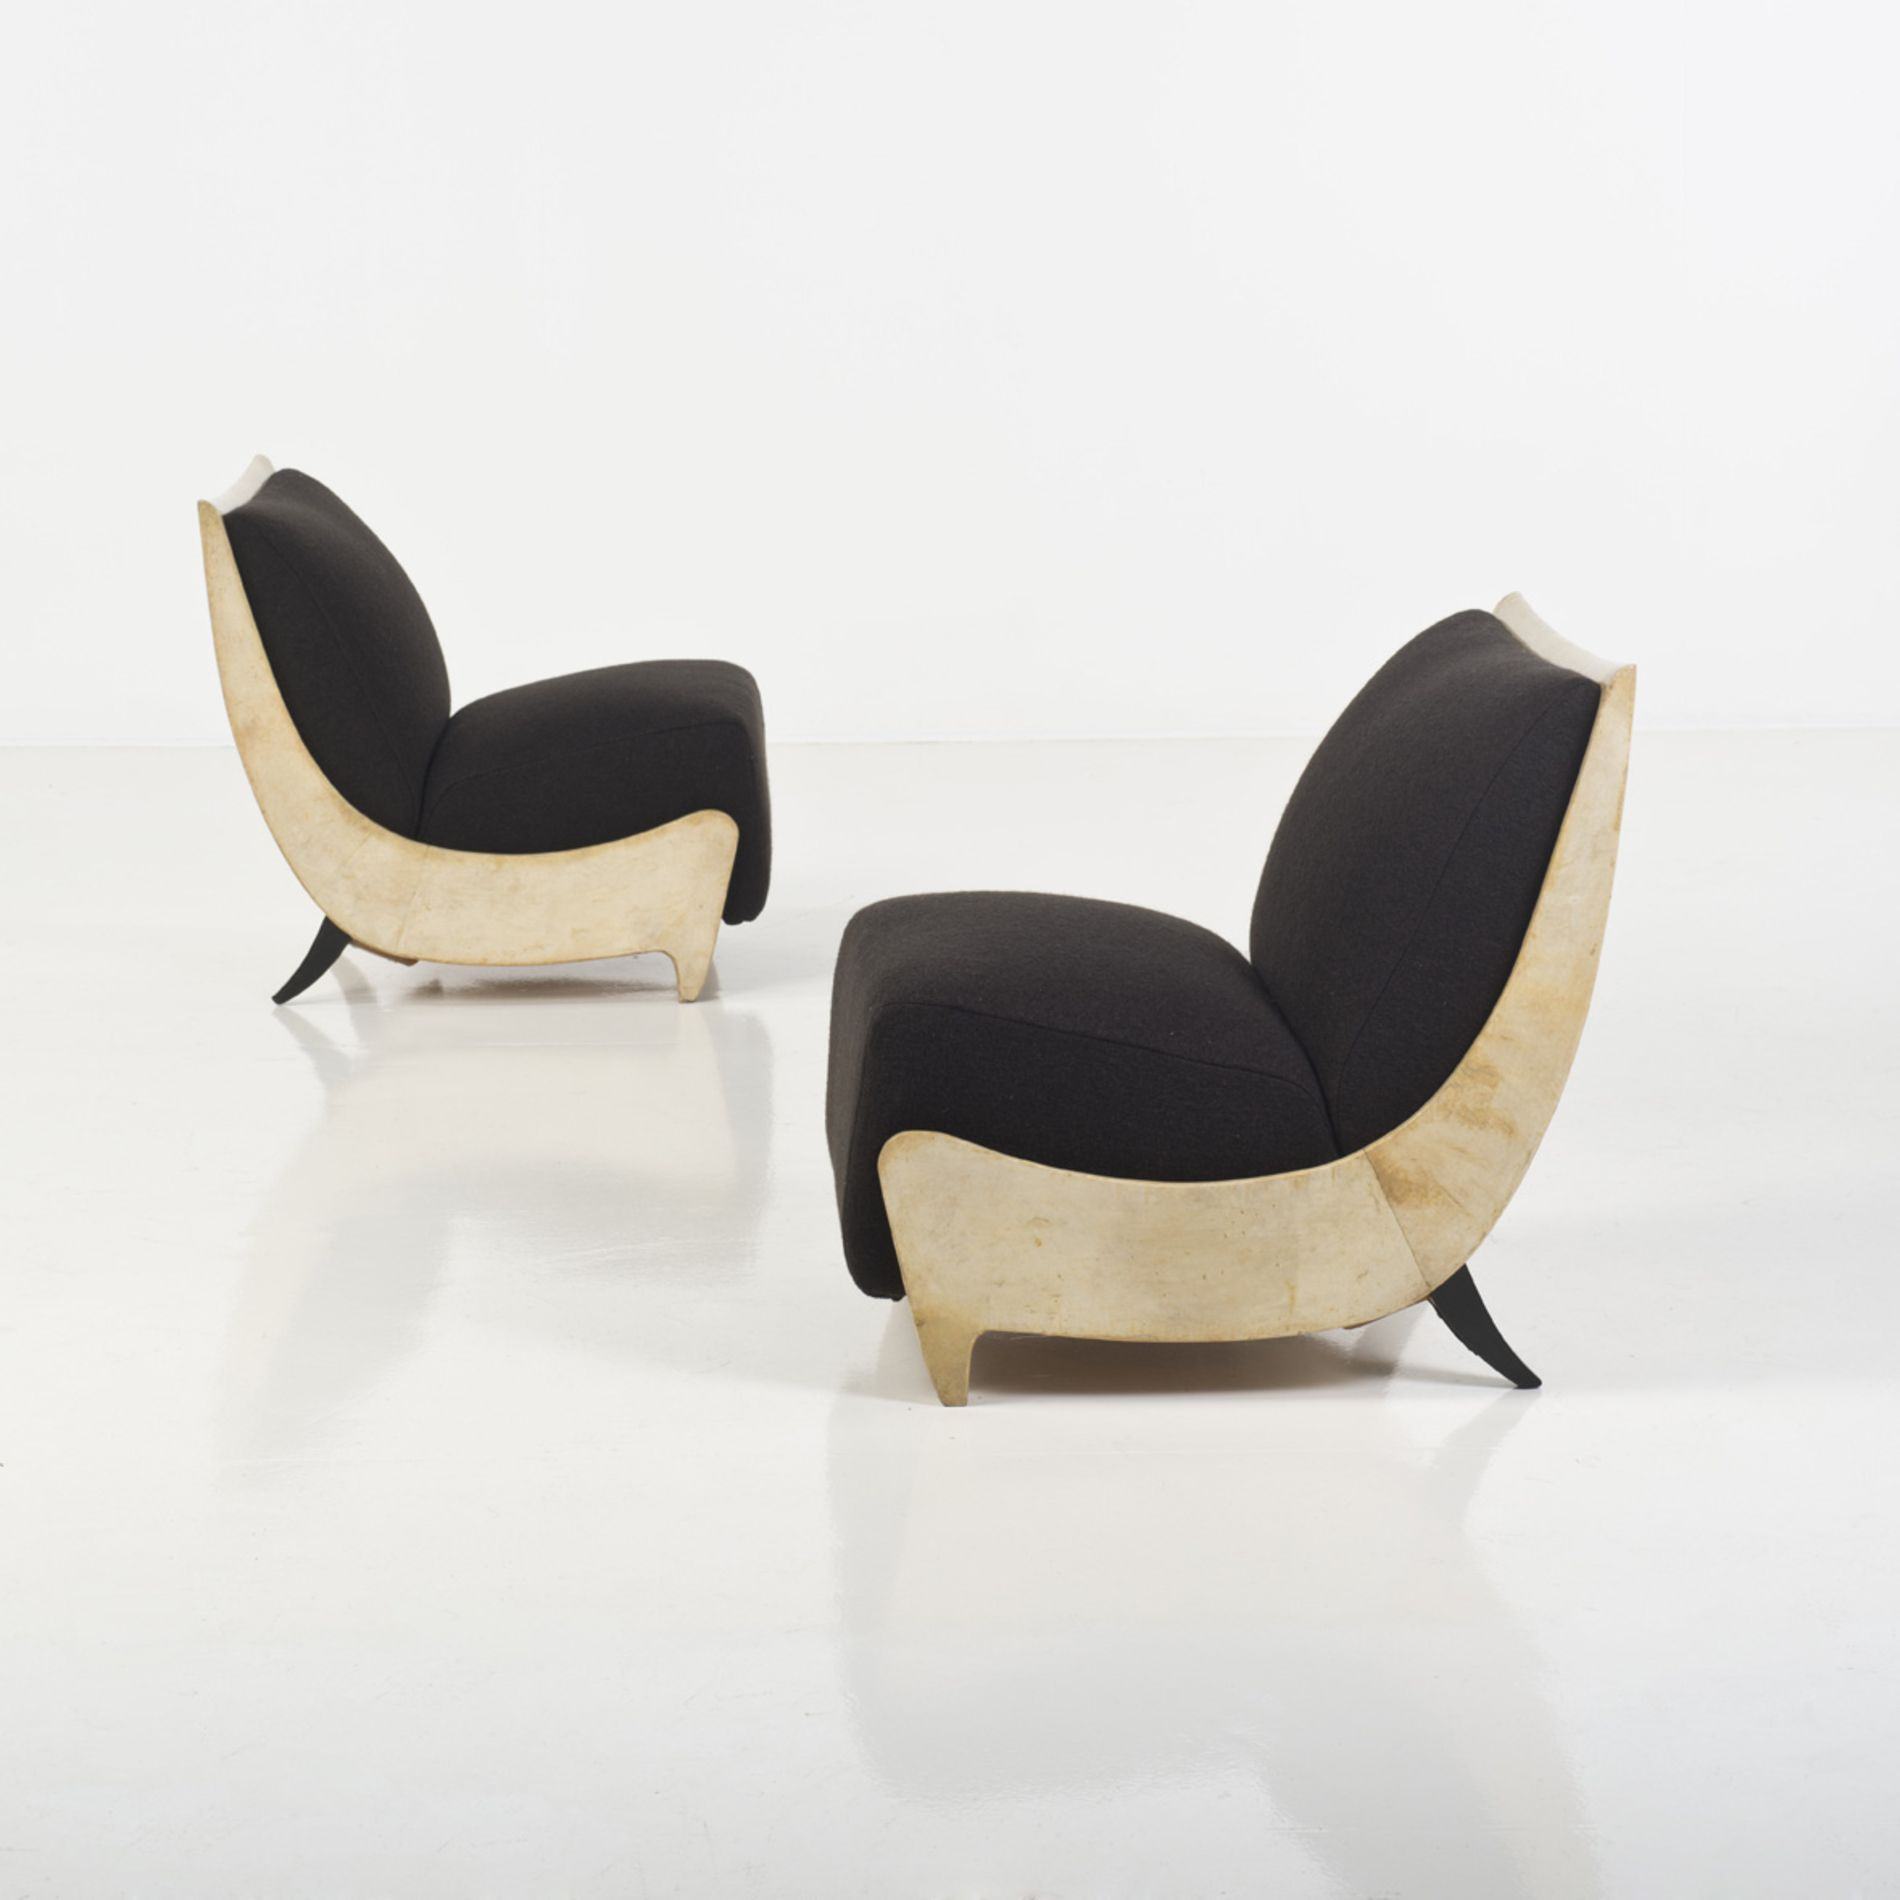 Piacentini  1881 1960       GoutFurnitureDesignersInstagramFurniture. Piacentini  1881 1960         Furniture   Pinterest   Product